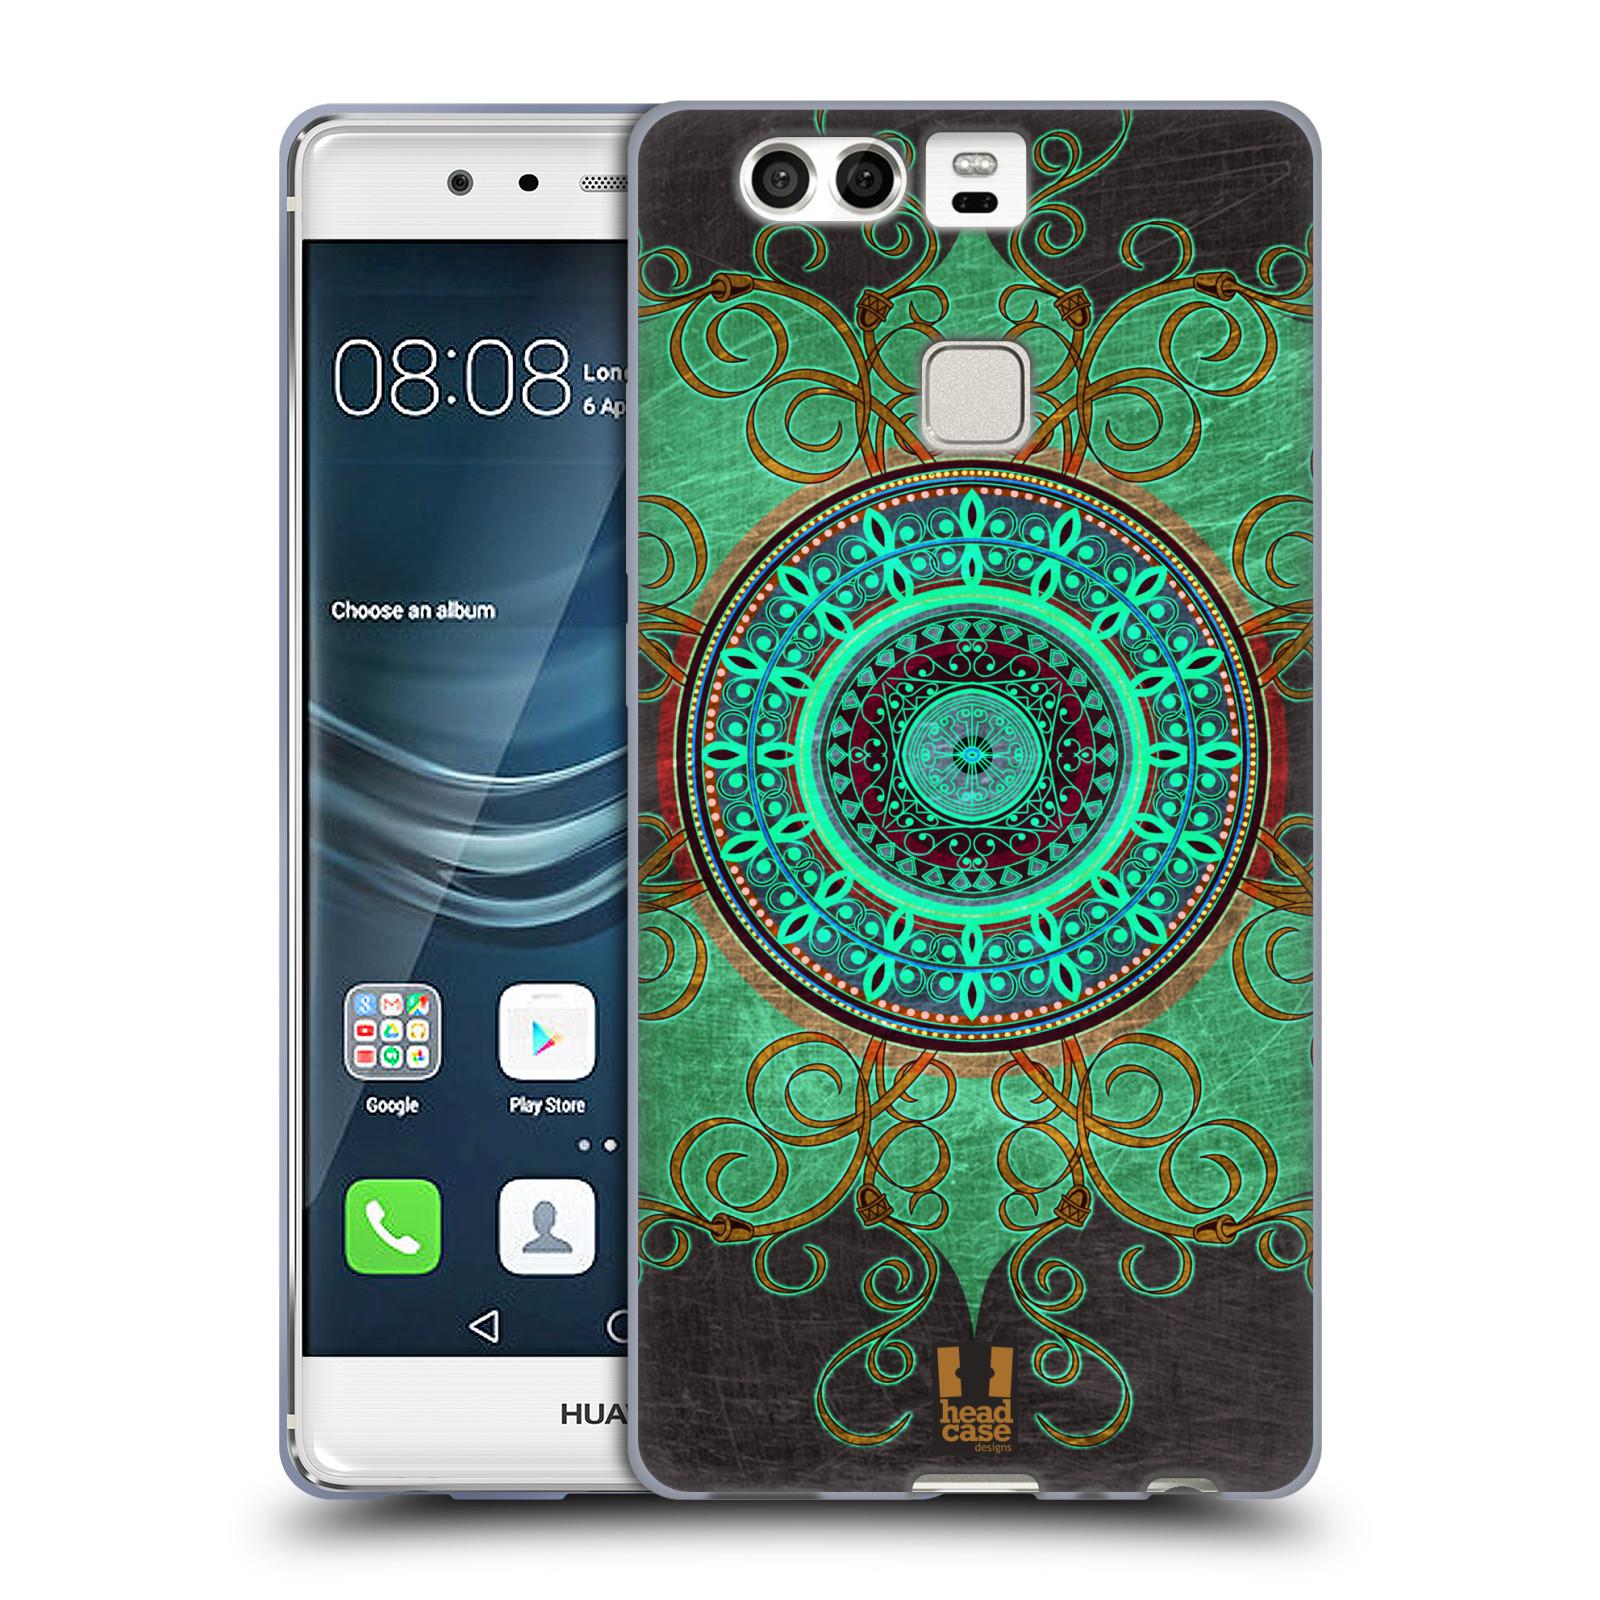 HEAD CASE silikonový obal na mobil Huawei P9 / P9 DUAL SIM vzor ARABESKA MANDALA ZELENÁ